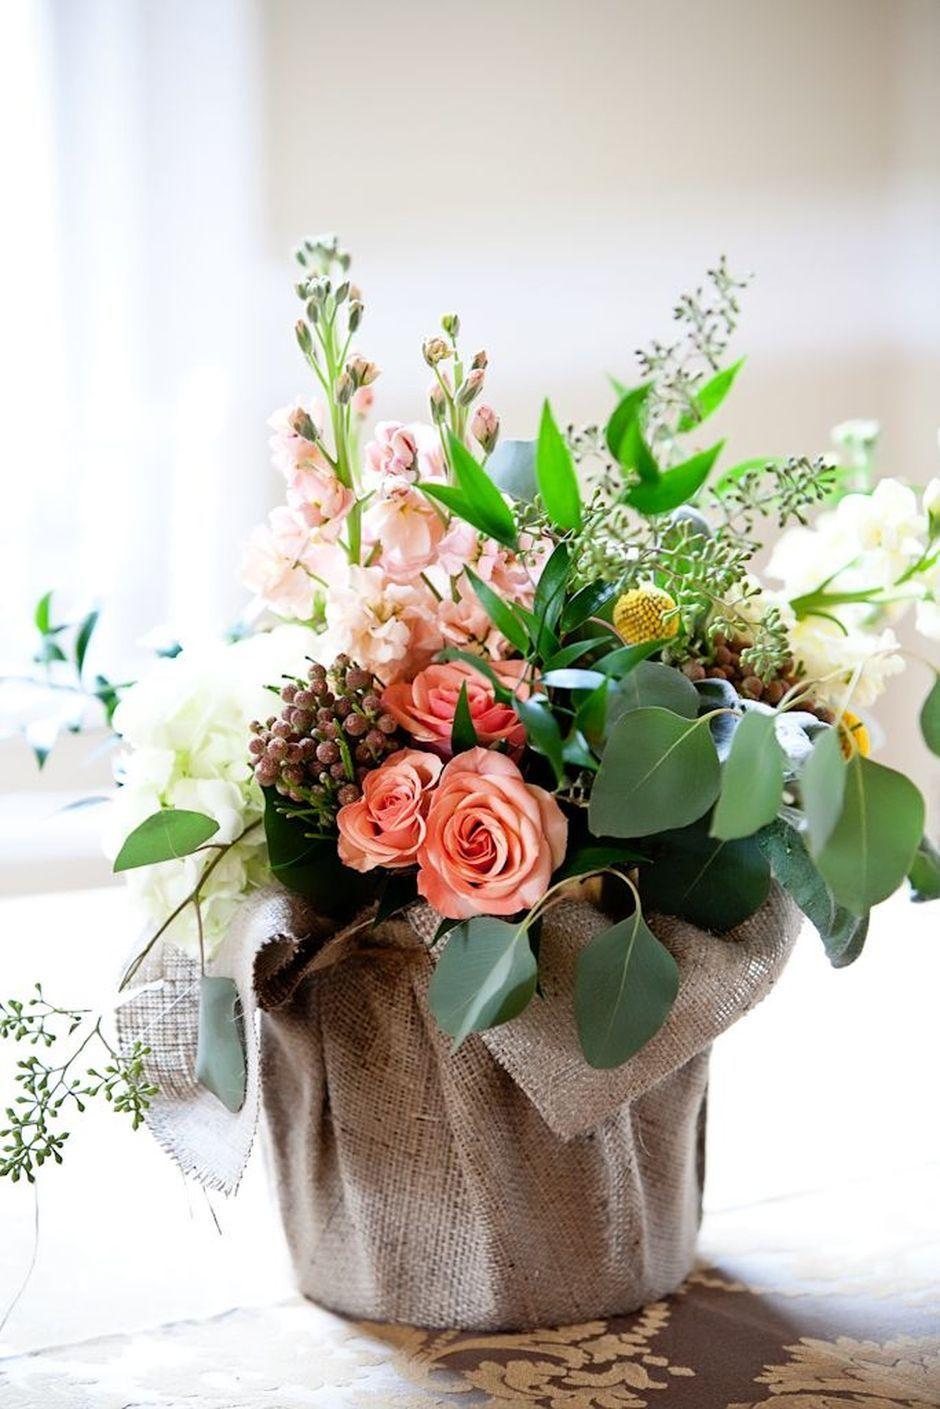 100 beauty spring flowers centerpieces arrangements ideas spring 100 beauty spring flowers centerpieces arrangements ideas izmirmasajfo